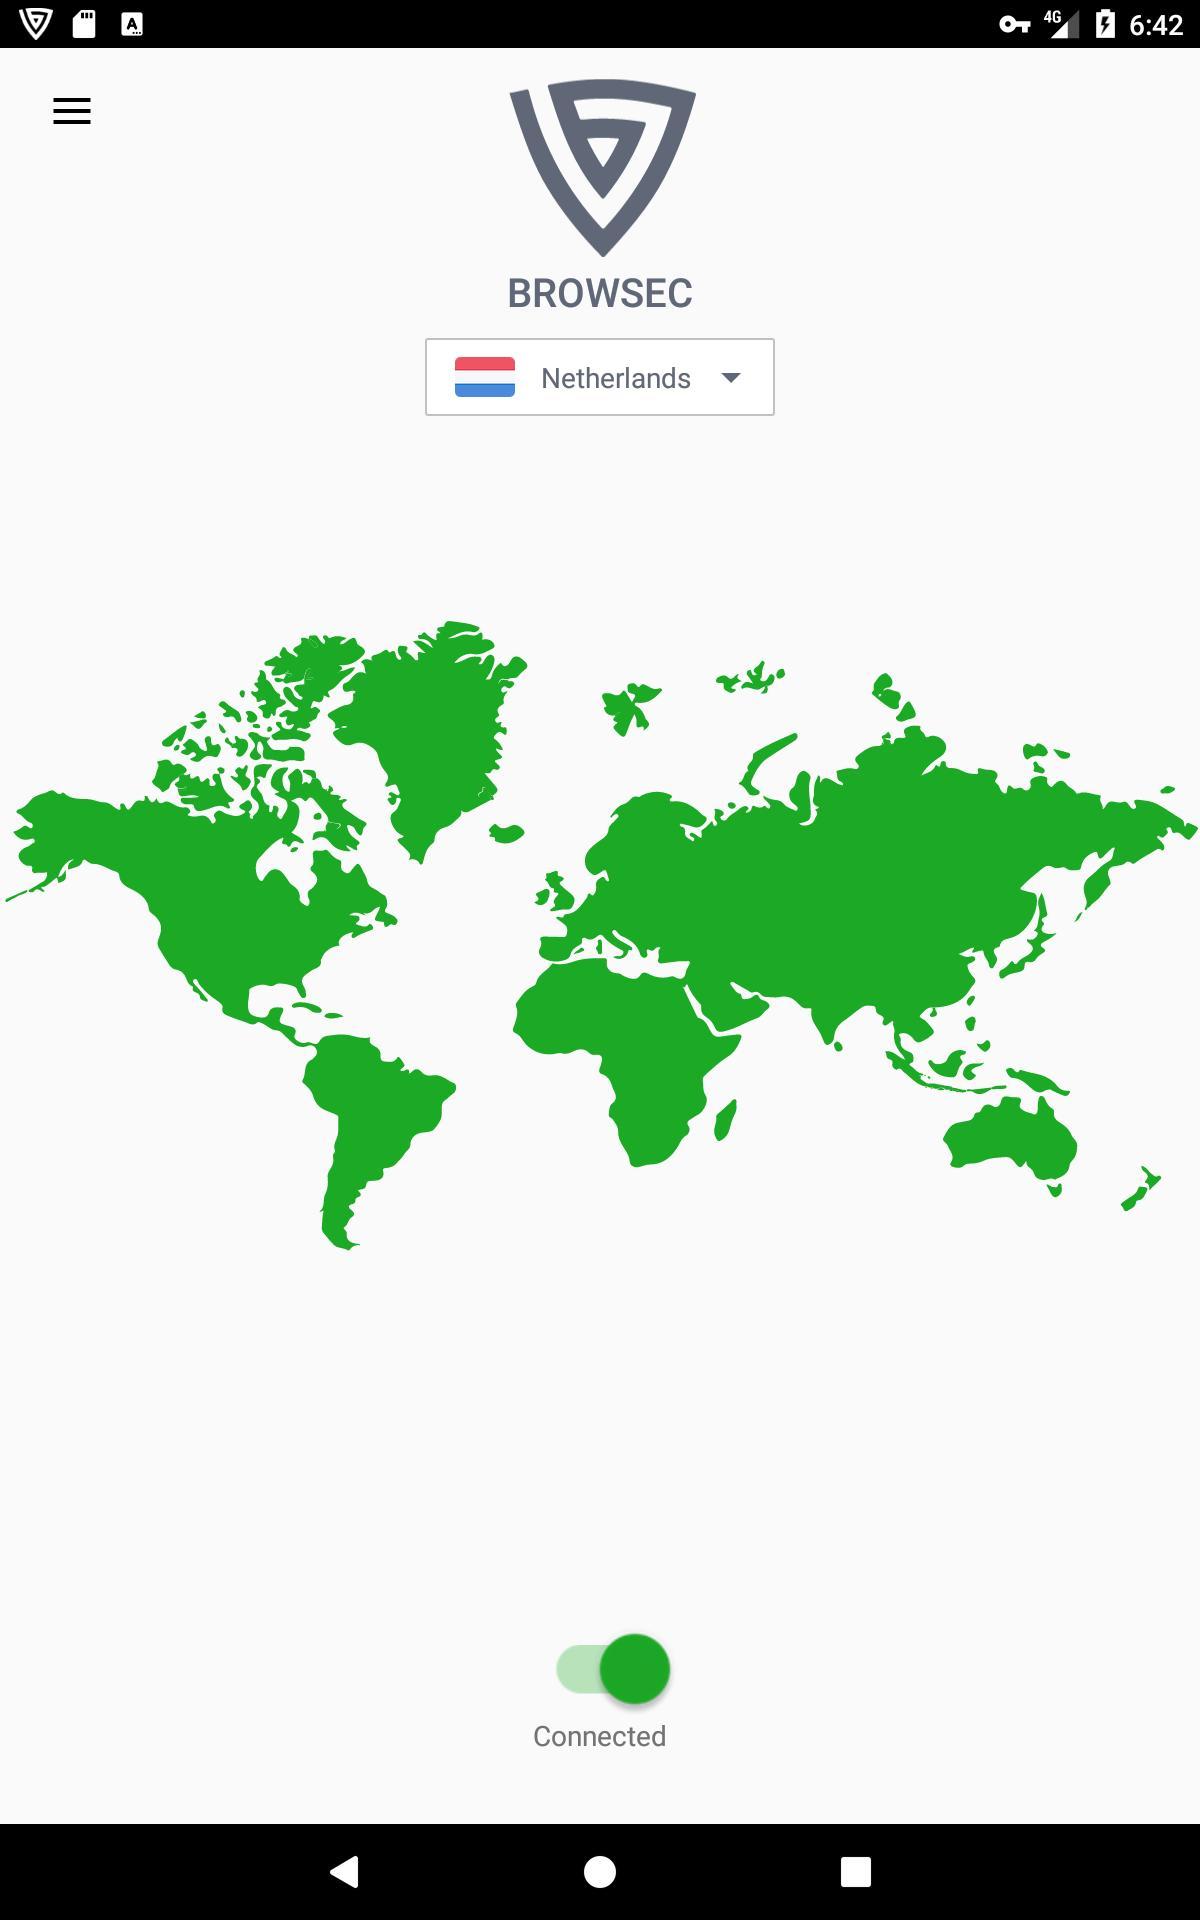 Browsec VPN - Free and Unlimited VPN 0.34 Screenshot 5